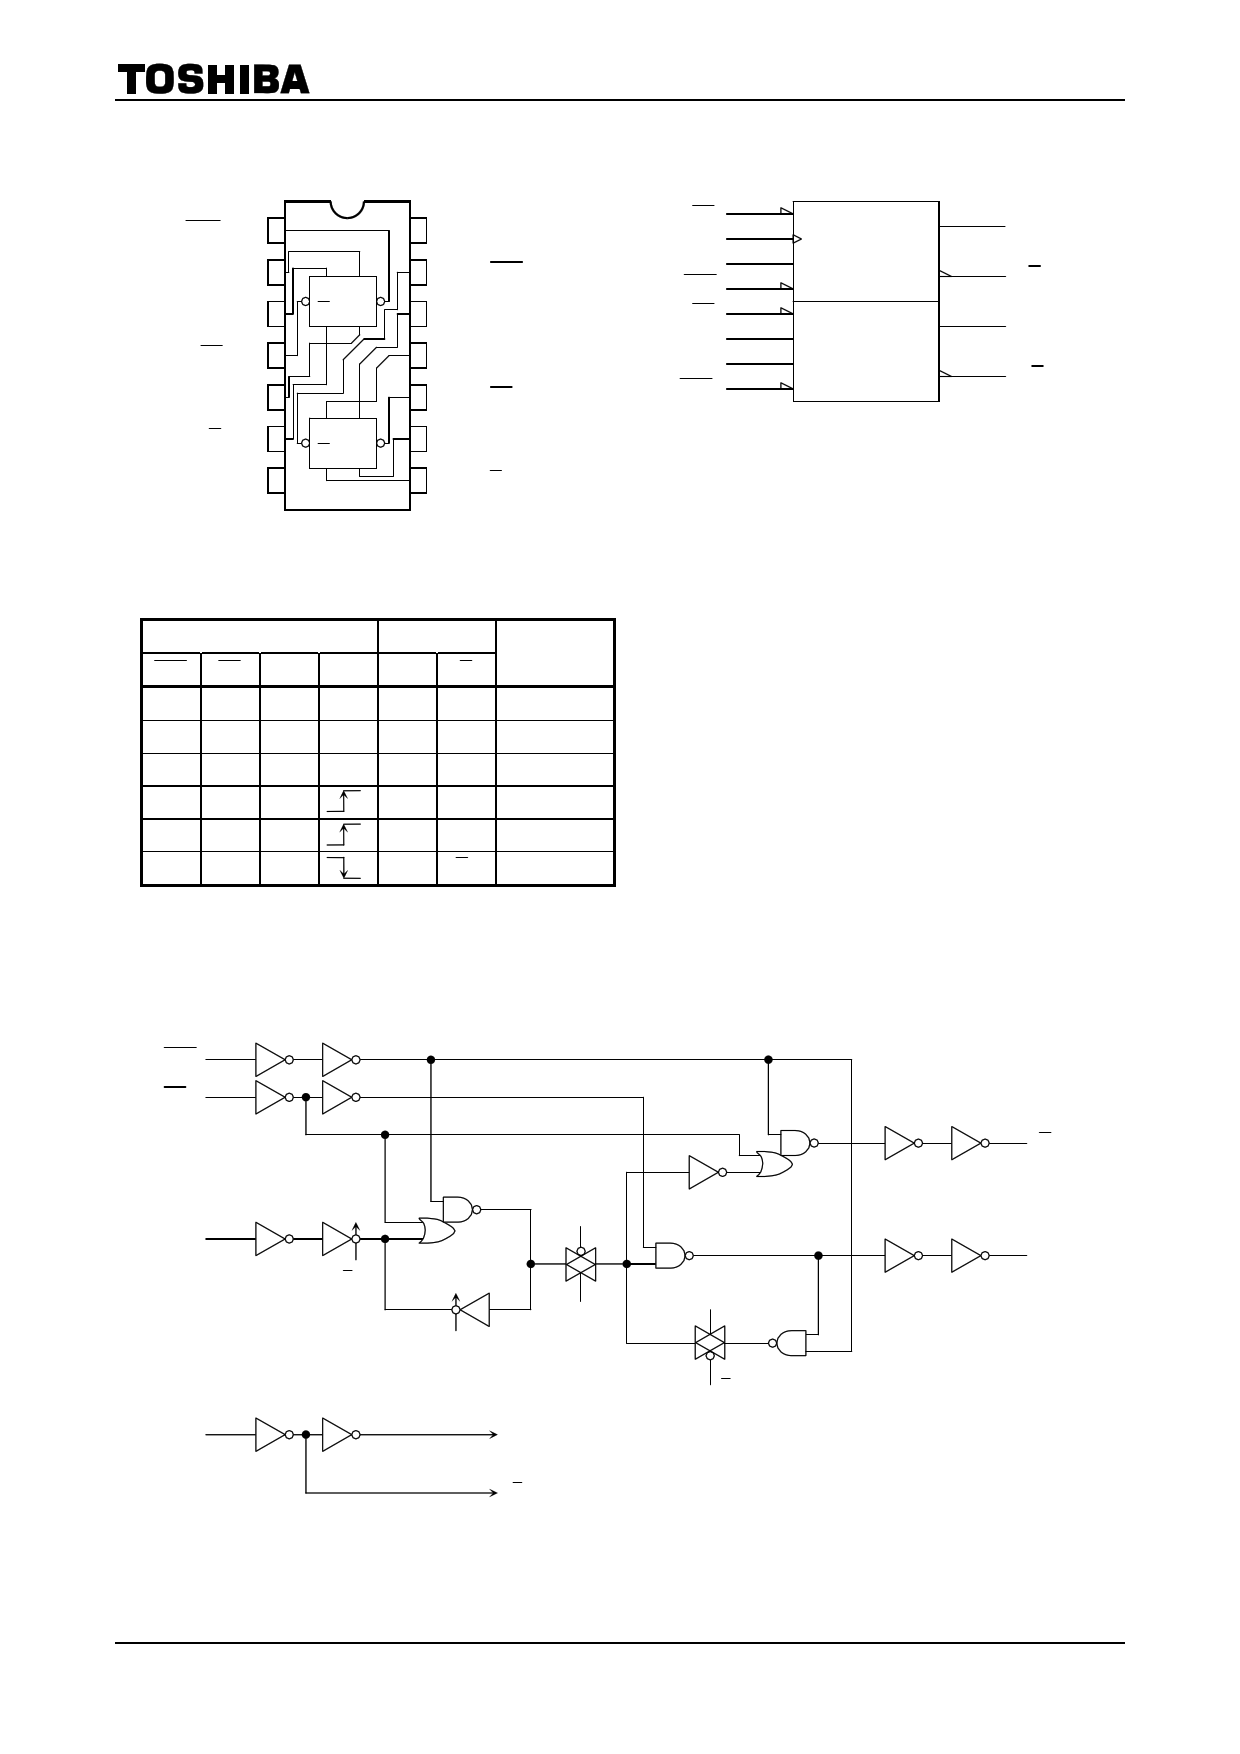 74ACT74P pdf, schematic